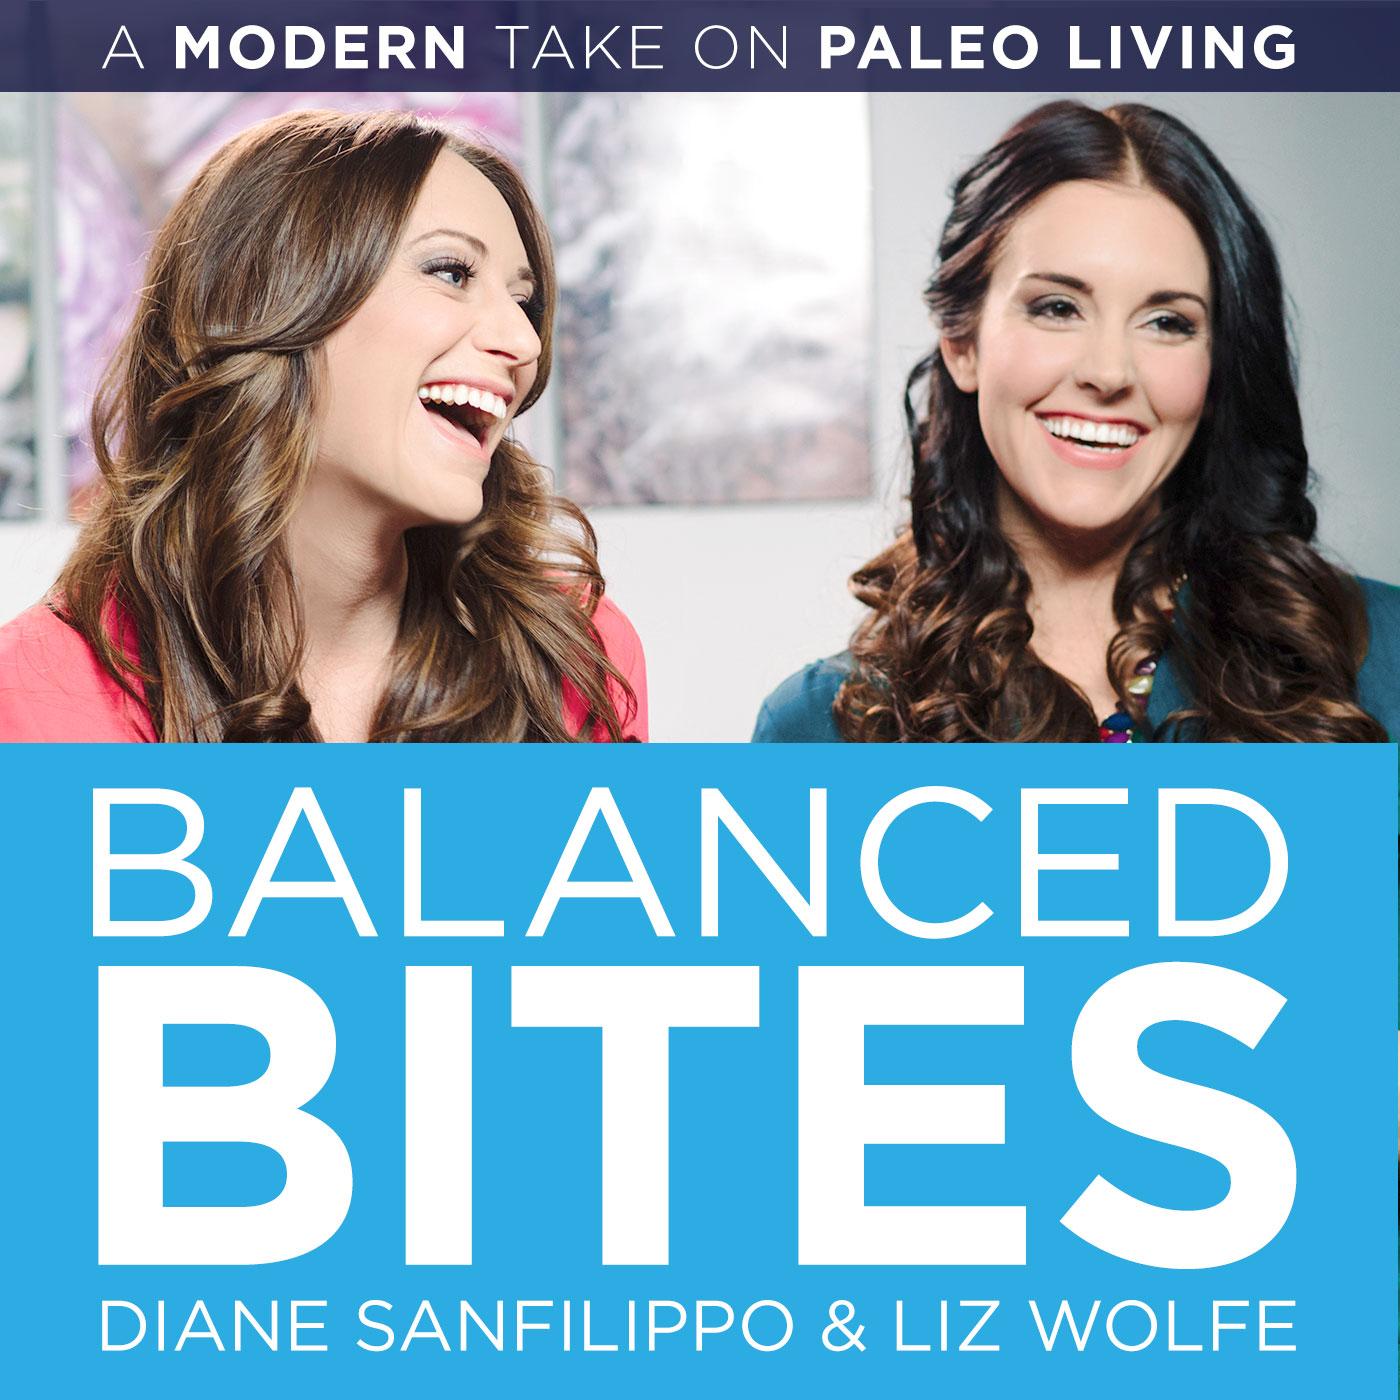 Balanced Bites: Modern paleo living with Diane Sanfilippo & Liz Wolfe.